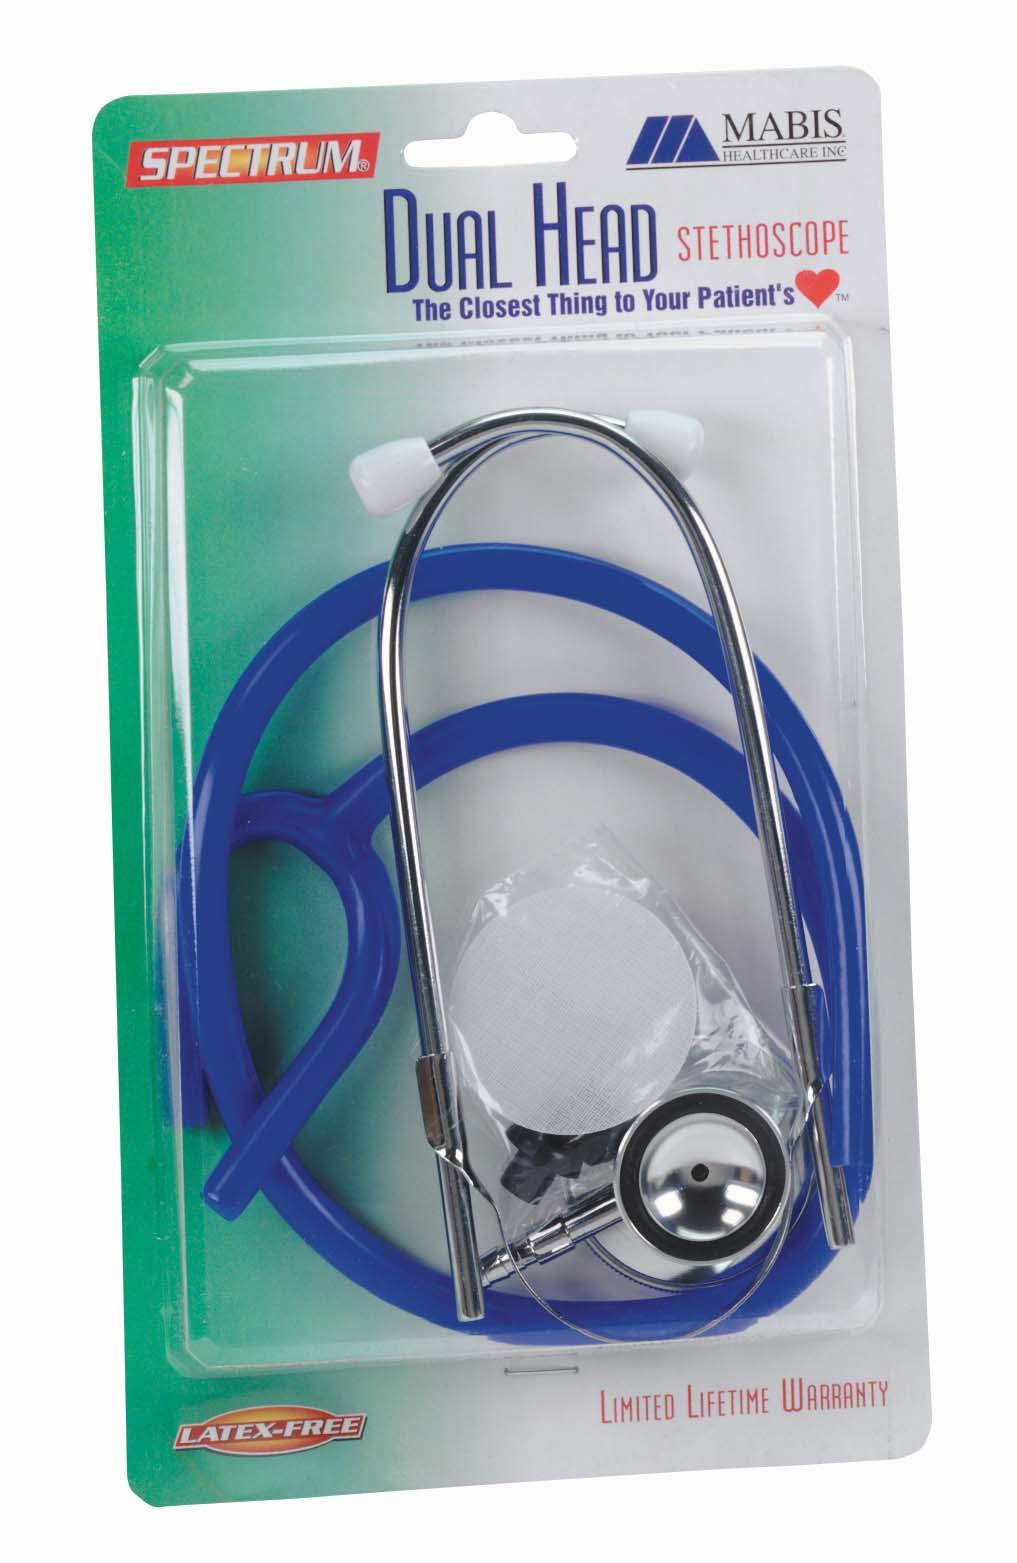 spectrum-dual-head-stethoscope-adult-slider-pack-black-10-429-020-lr.jpg